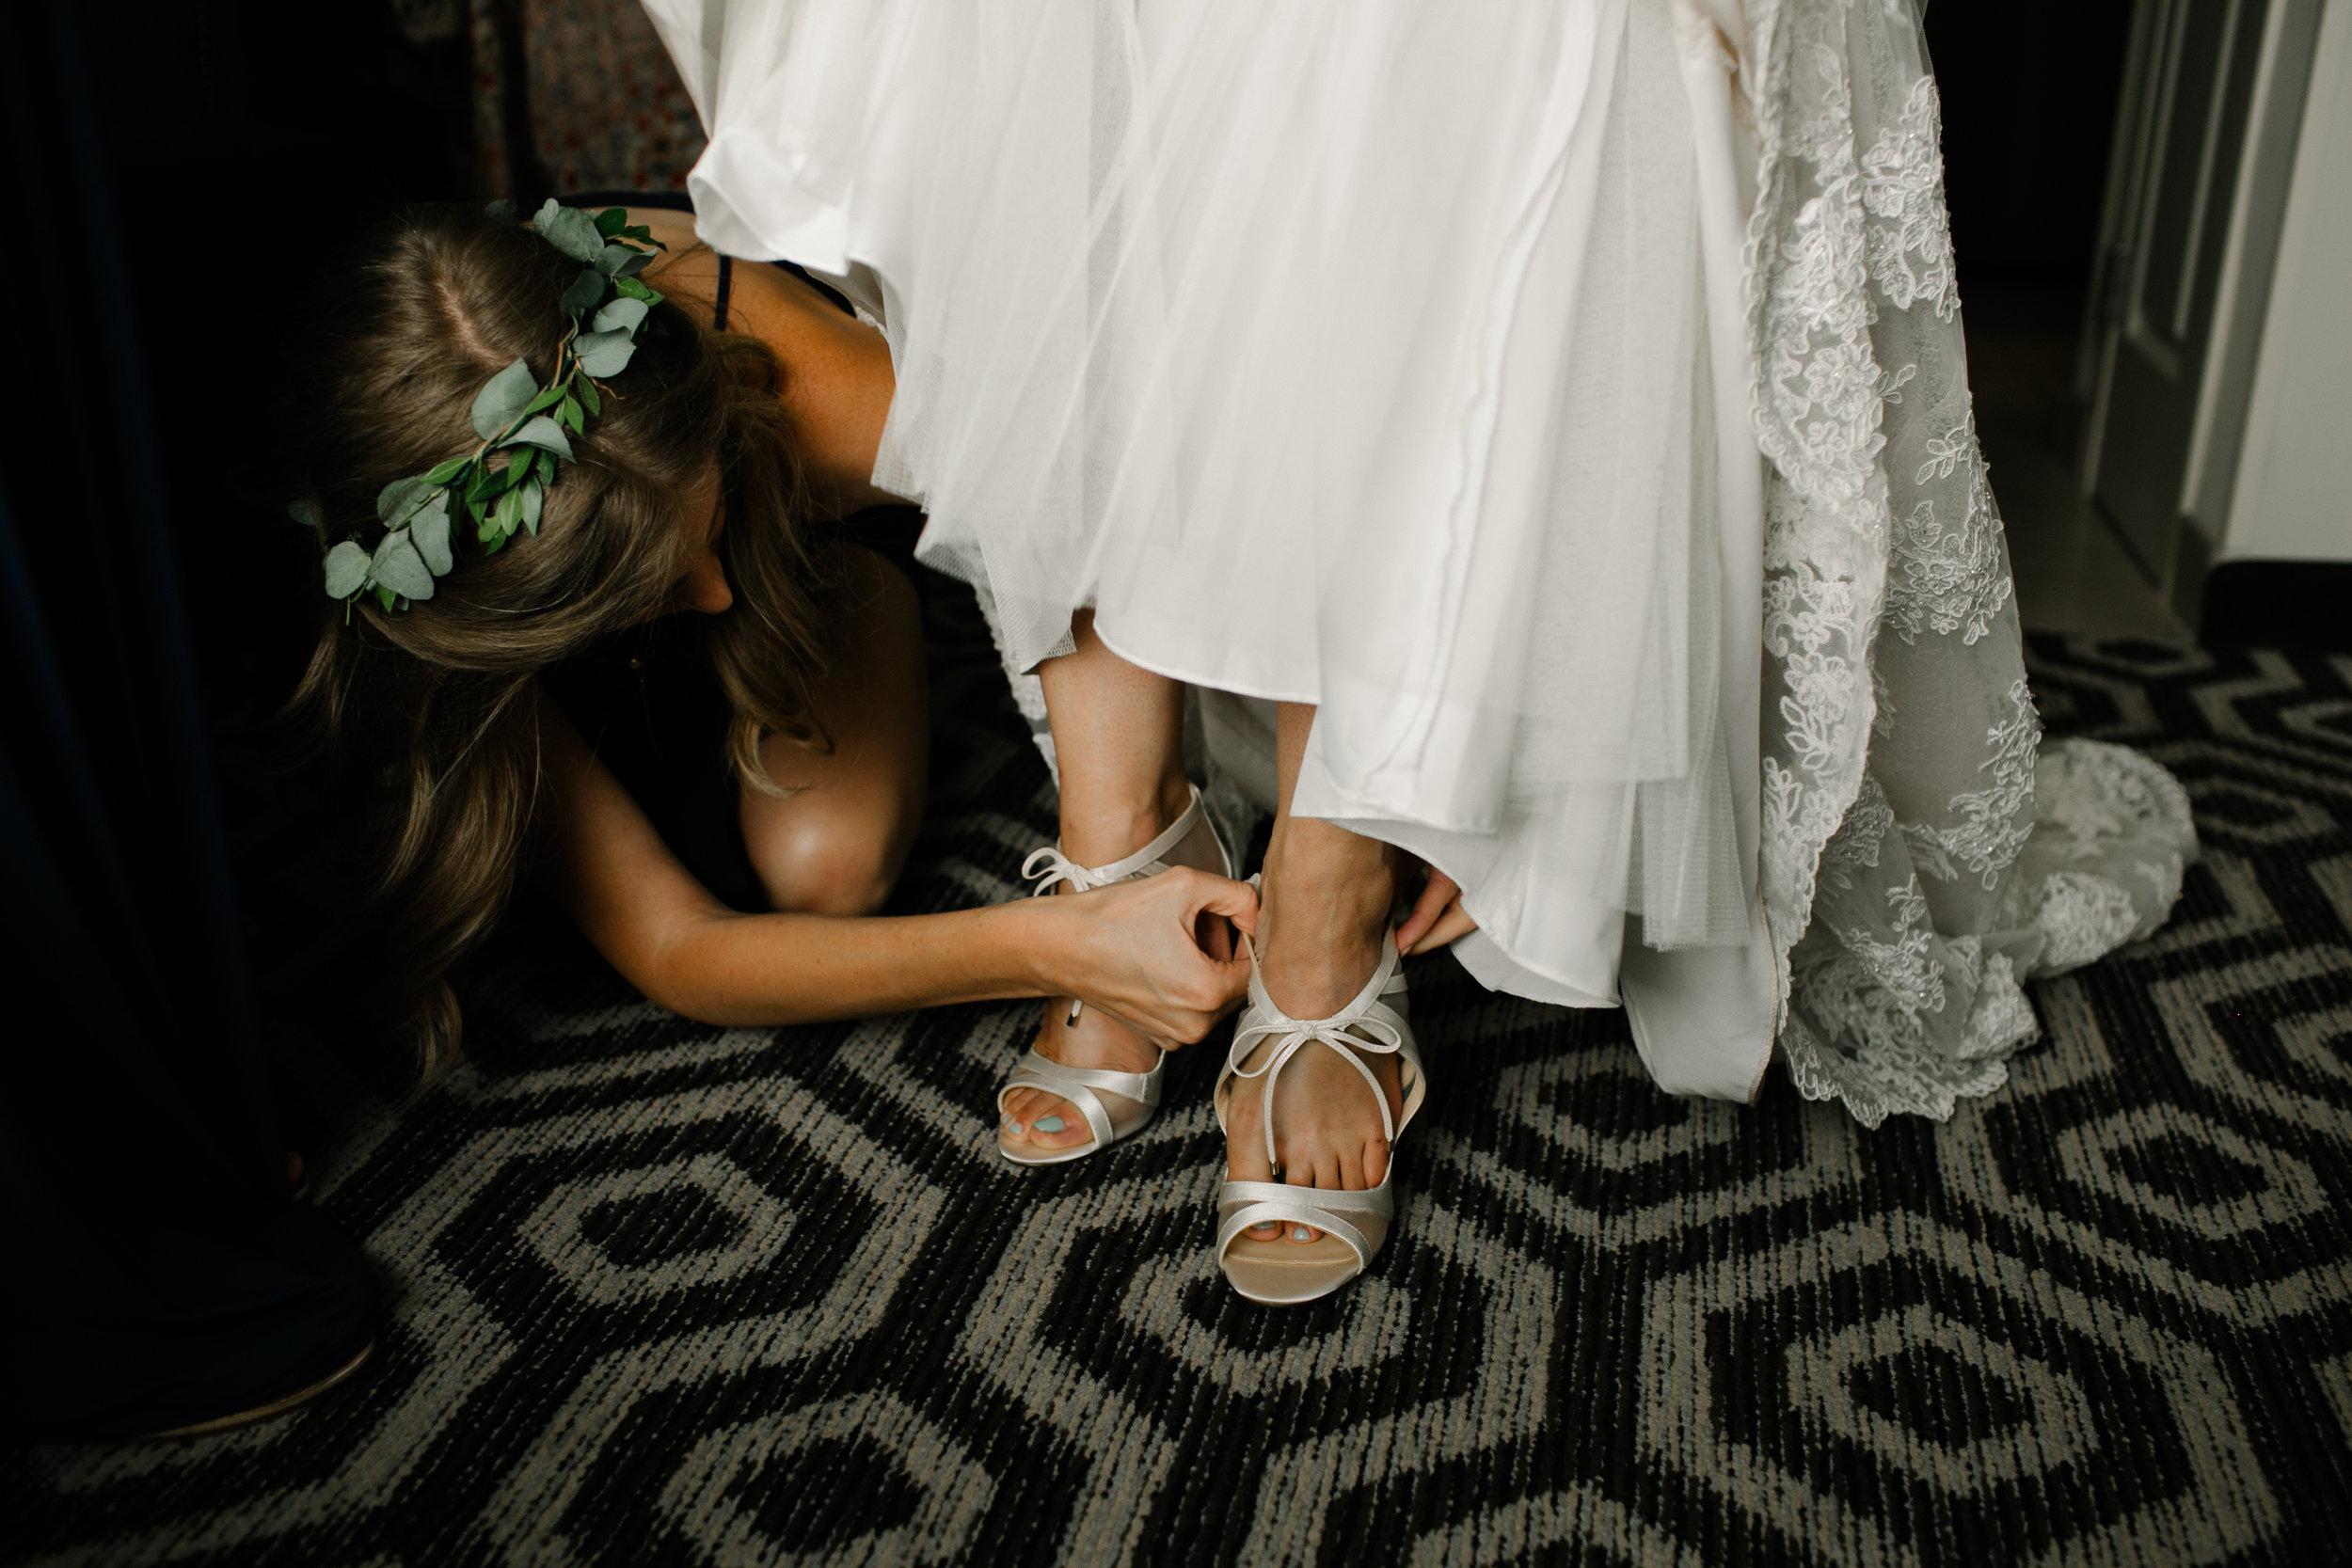 Sevlynn-Photography-Teresa-Chandler-Wedding-5.jpg